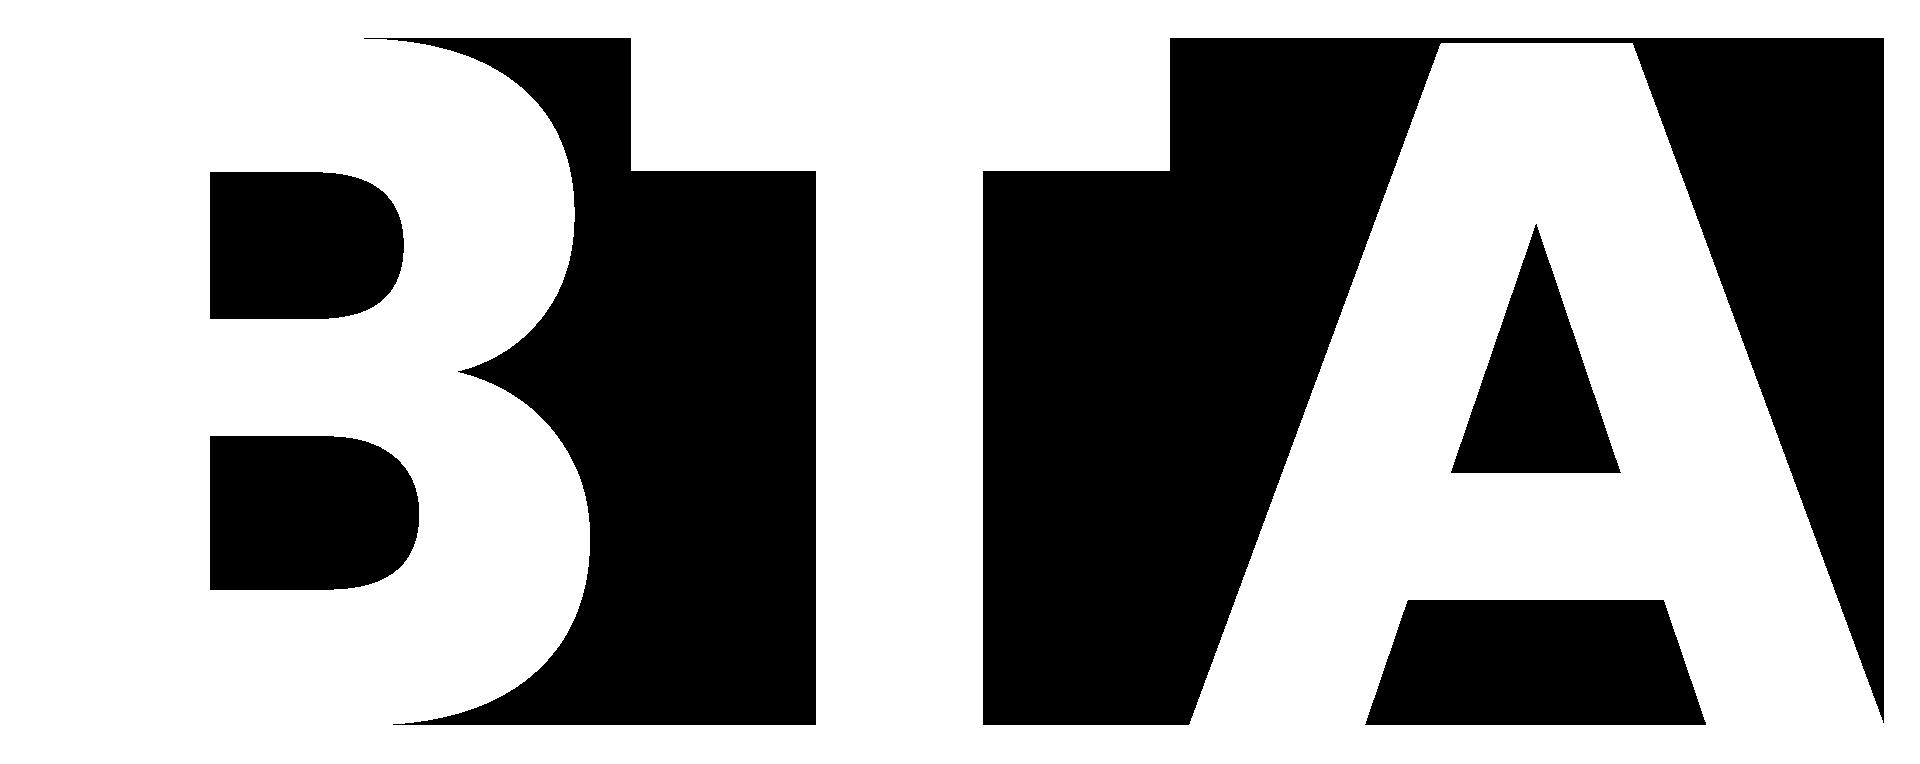 Broadway Tech Accelerator